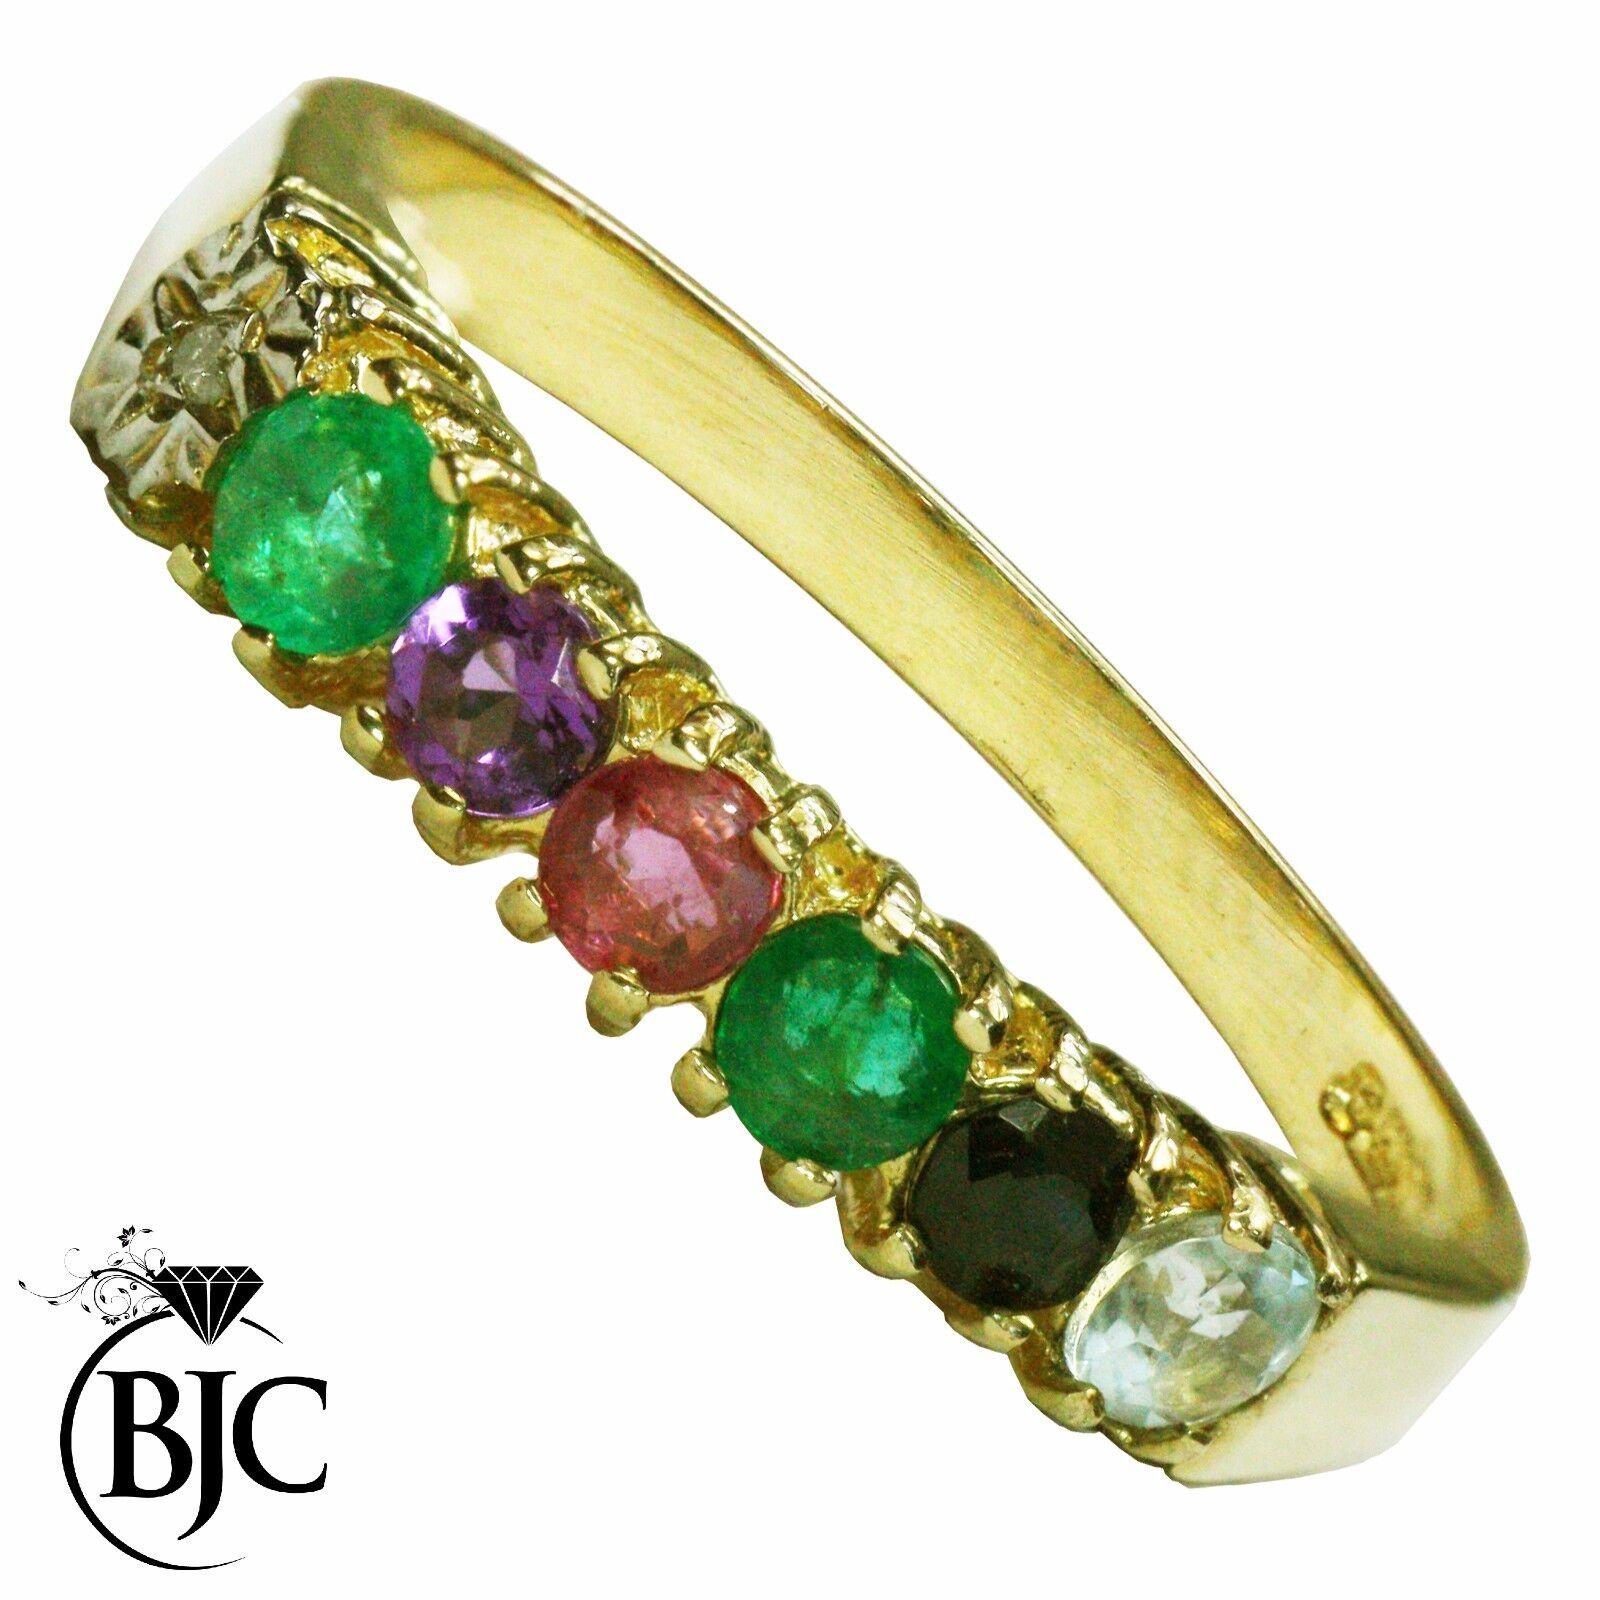 BJC\u00ae 9ct Yellow Gold Amethyst /& Diamond Emerald Shape Solitaire Ring R272 High Quality British Made Jewellery